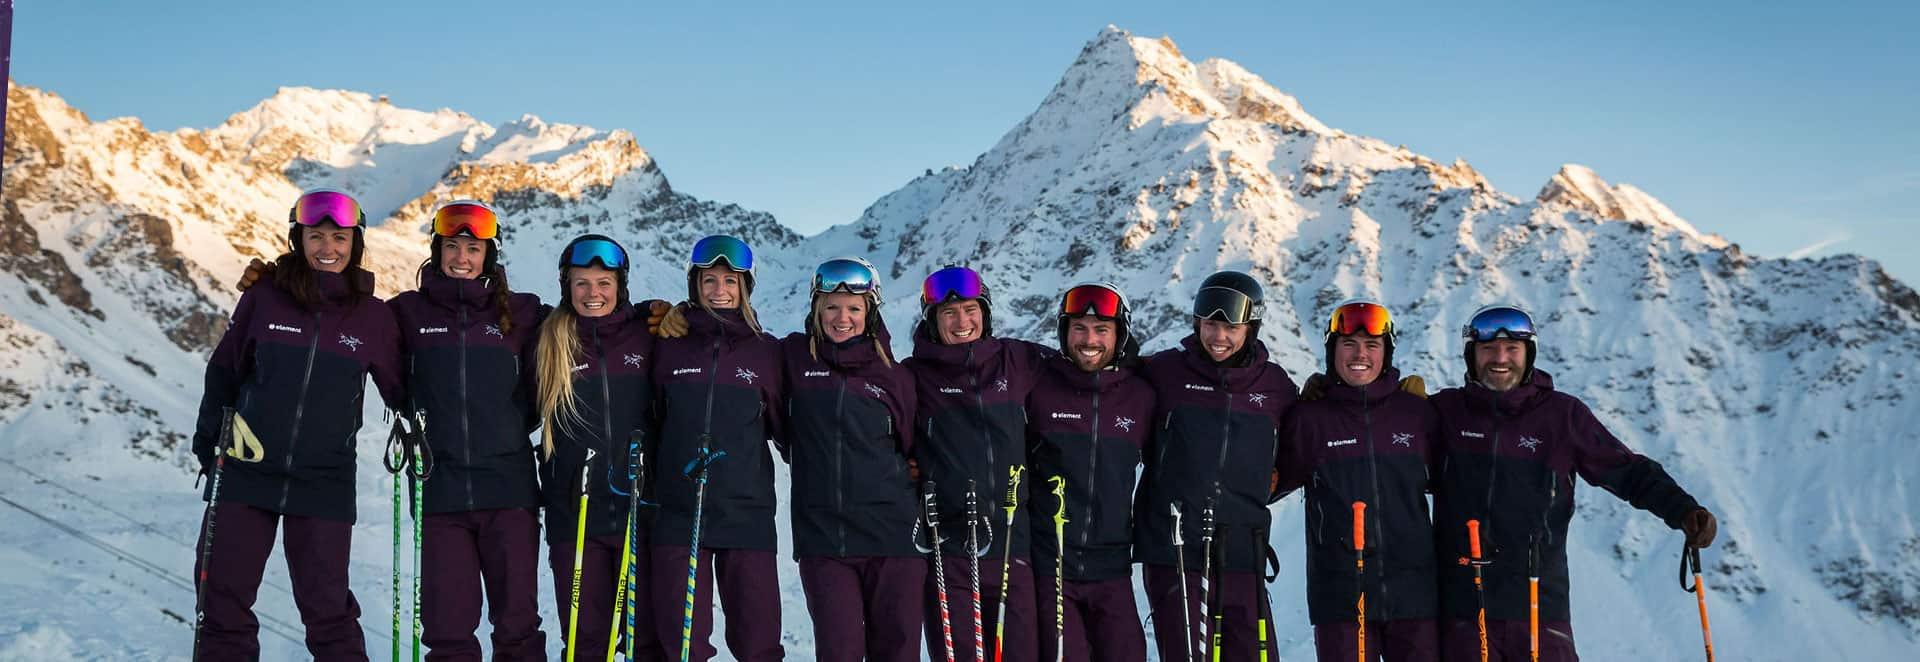 Element ski school - Team shot - Covid coronavirus cancellation policy page